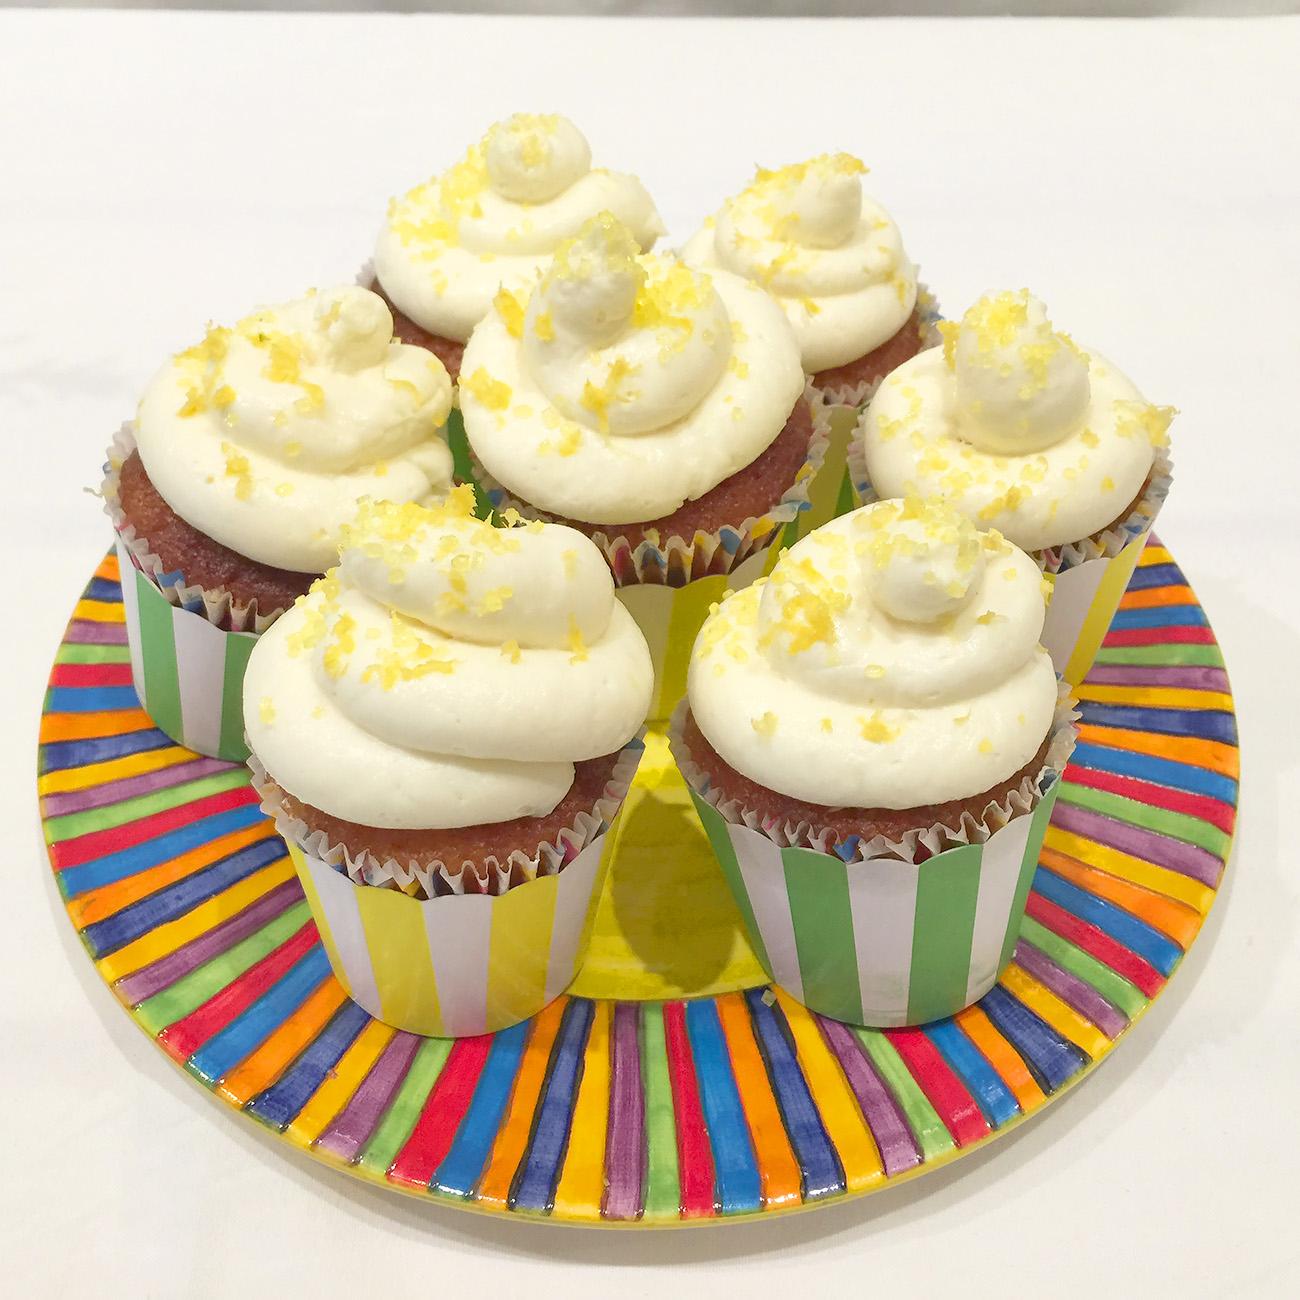 cupcakes-limon2